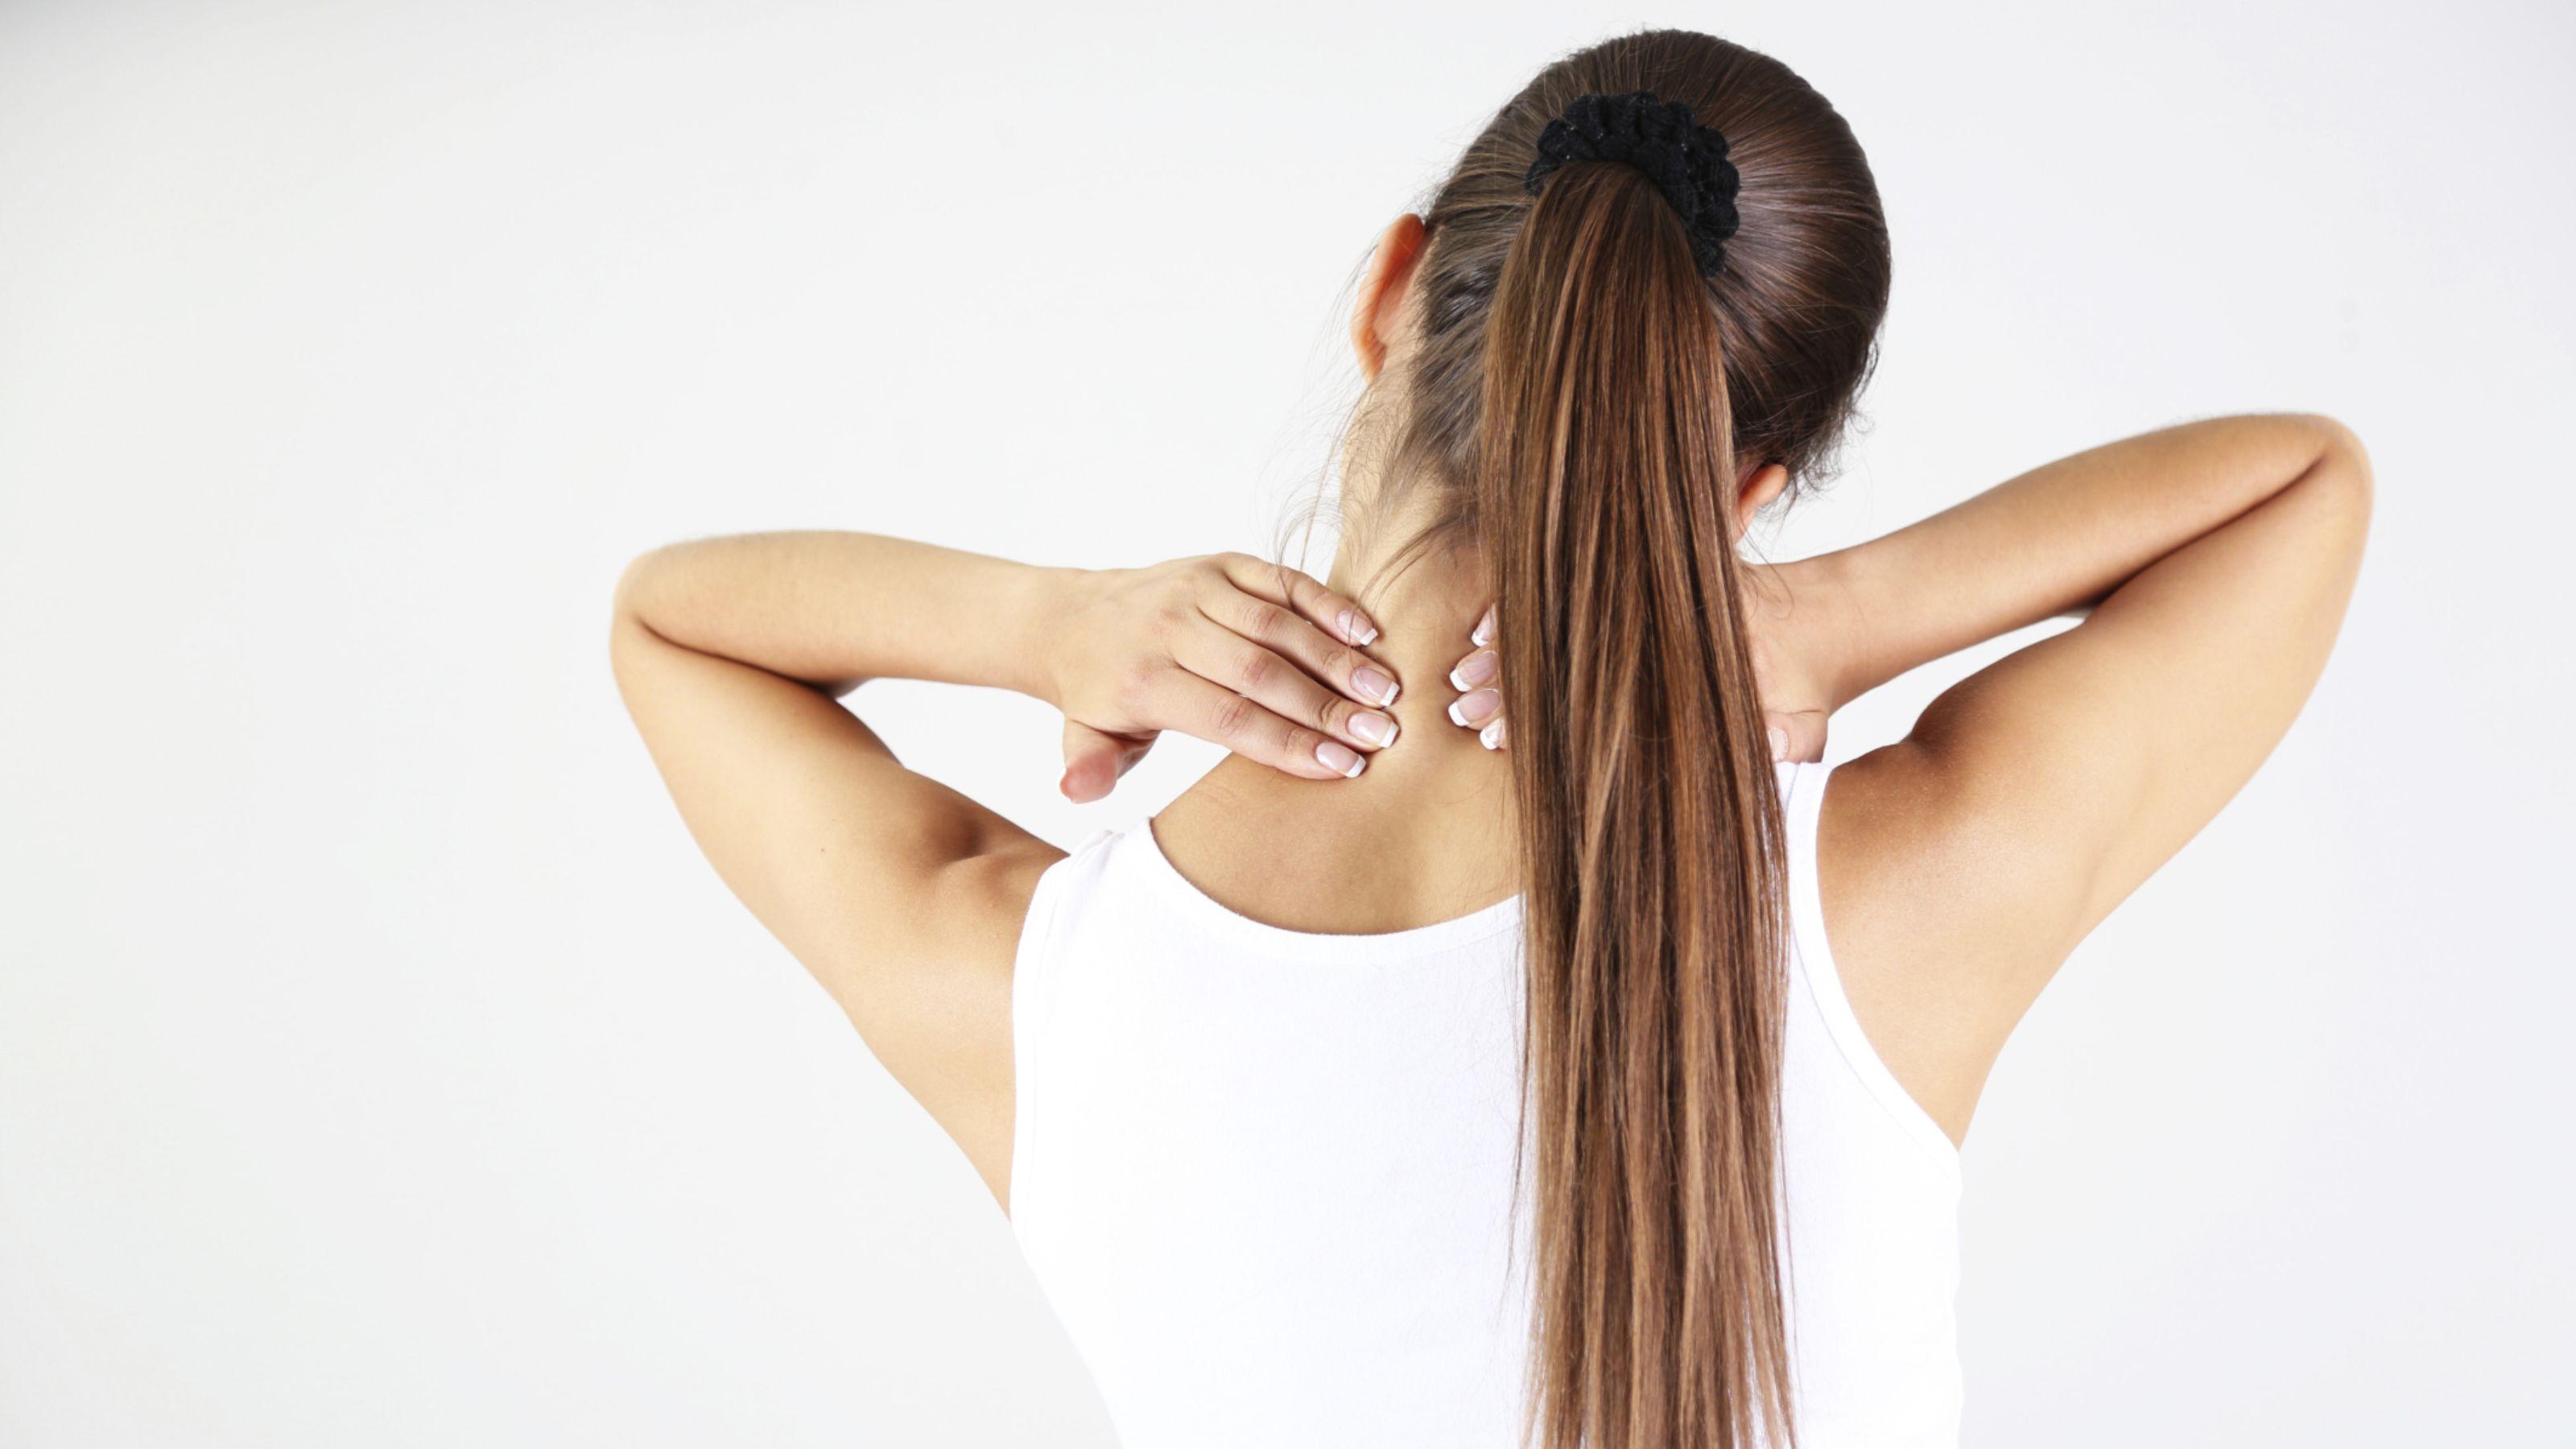 QLD spine - Neck problems